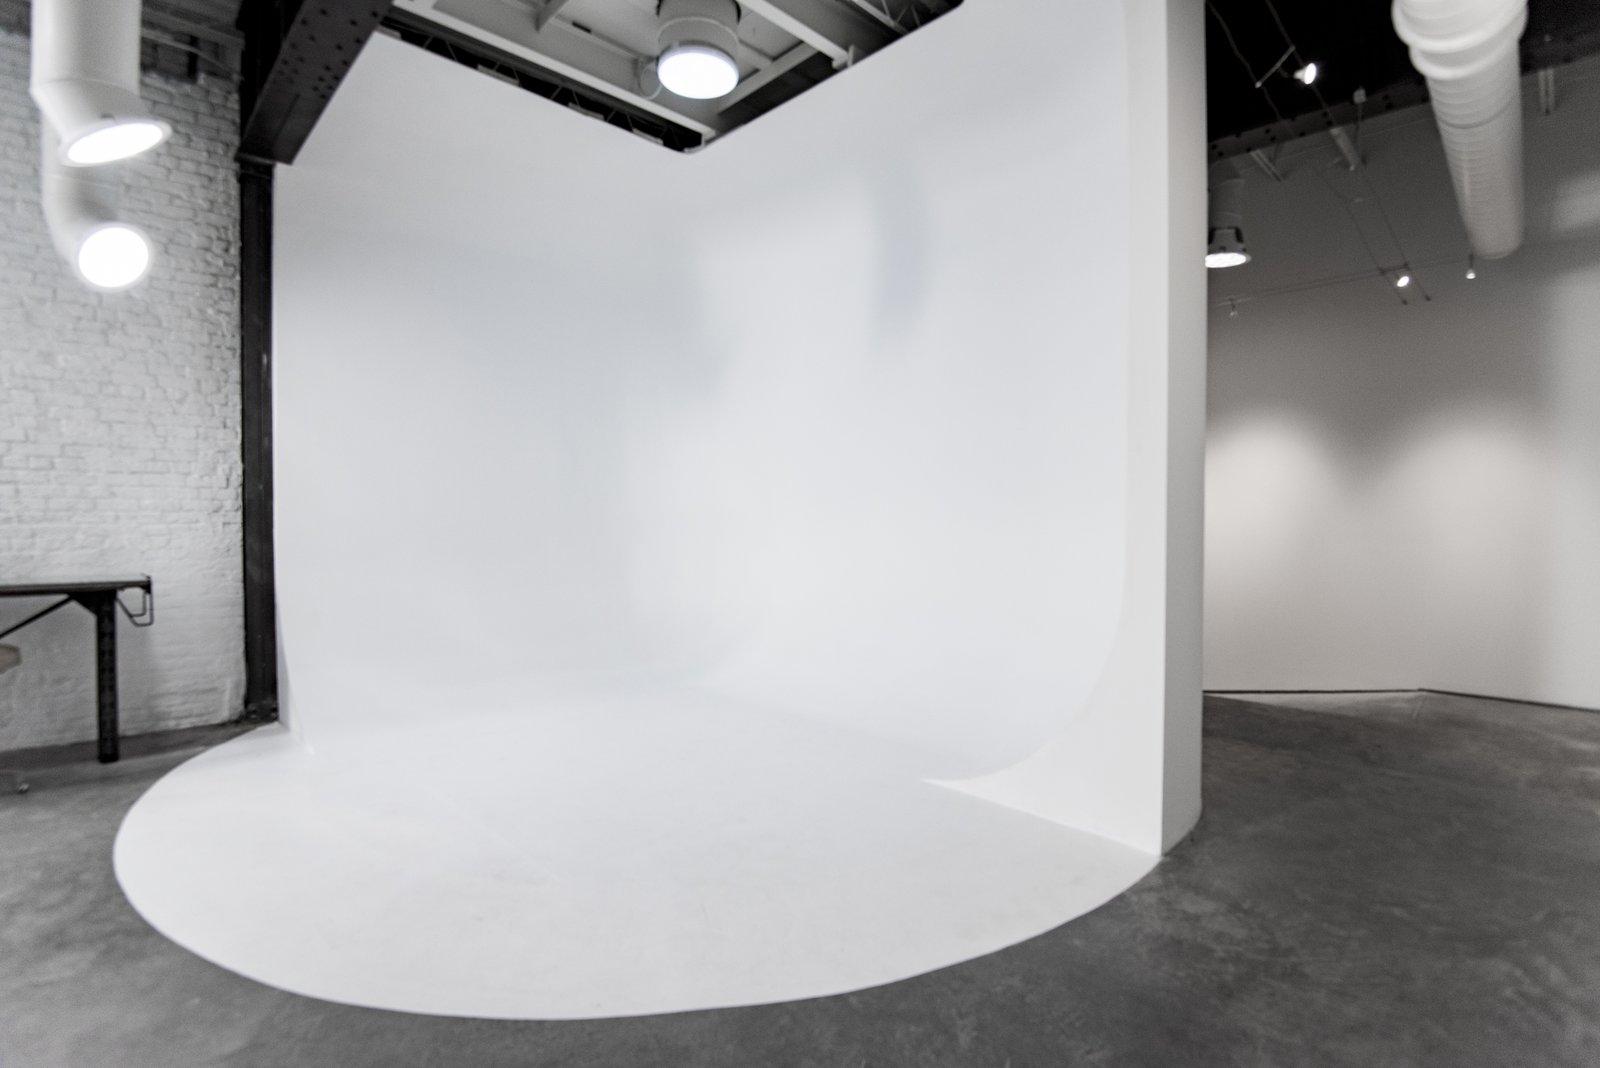 Studio cyclorama wall